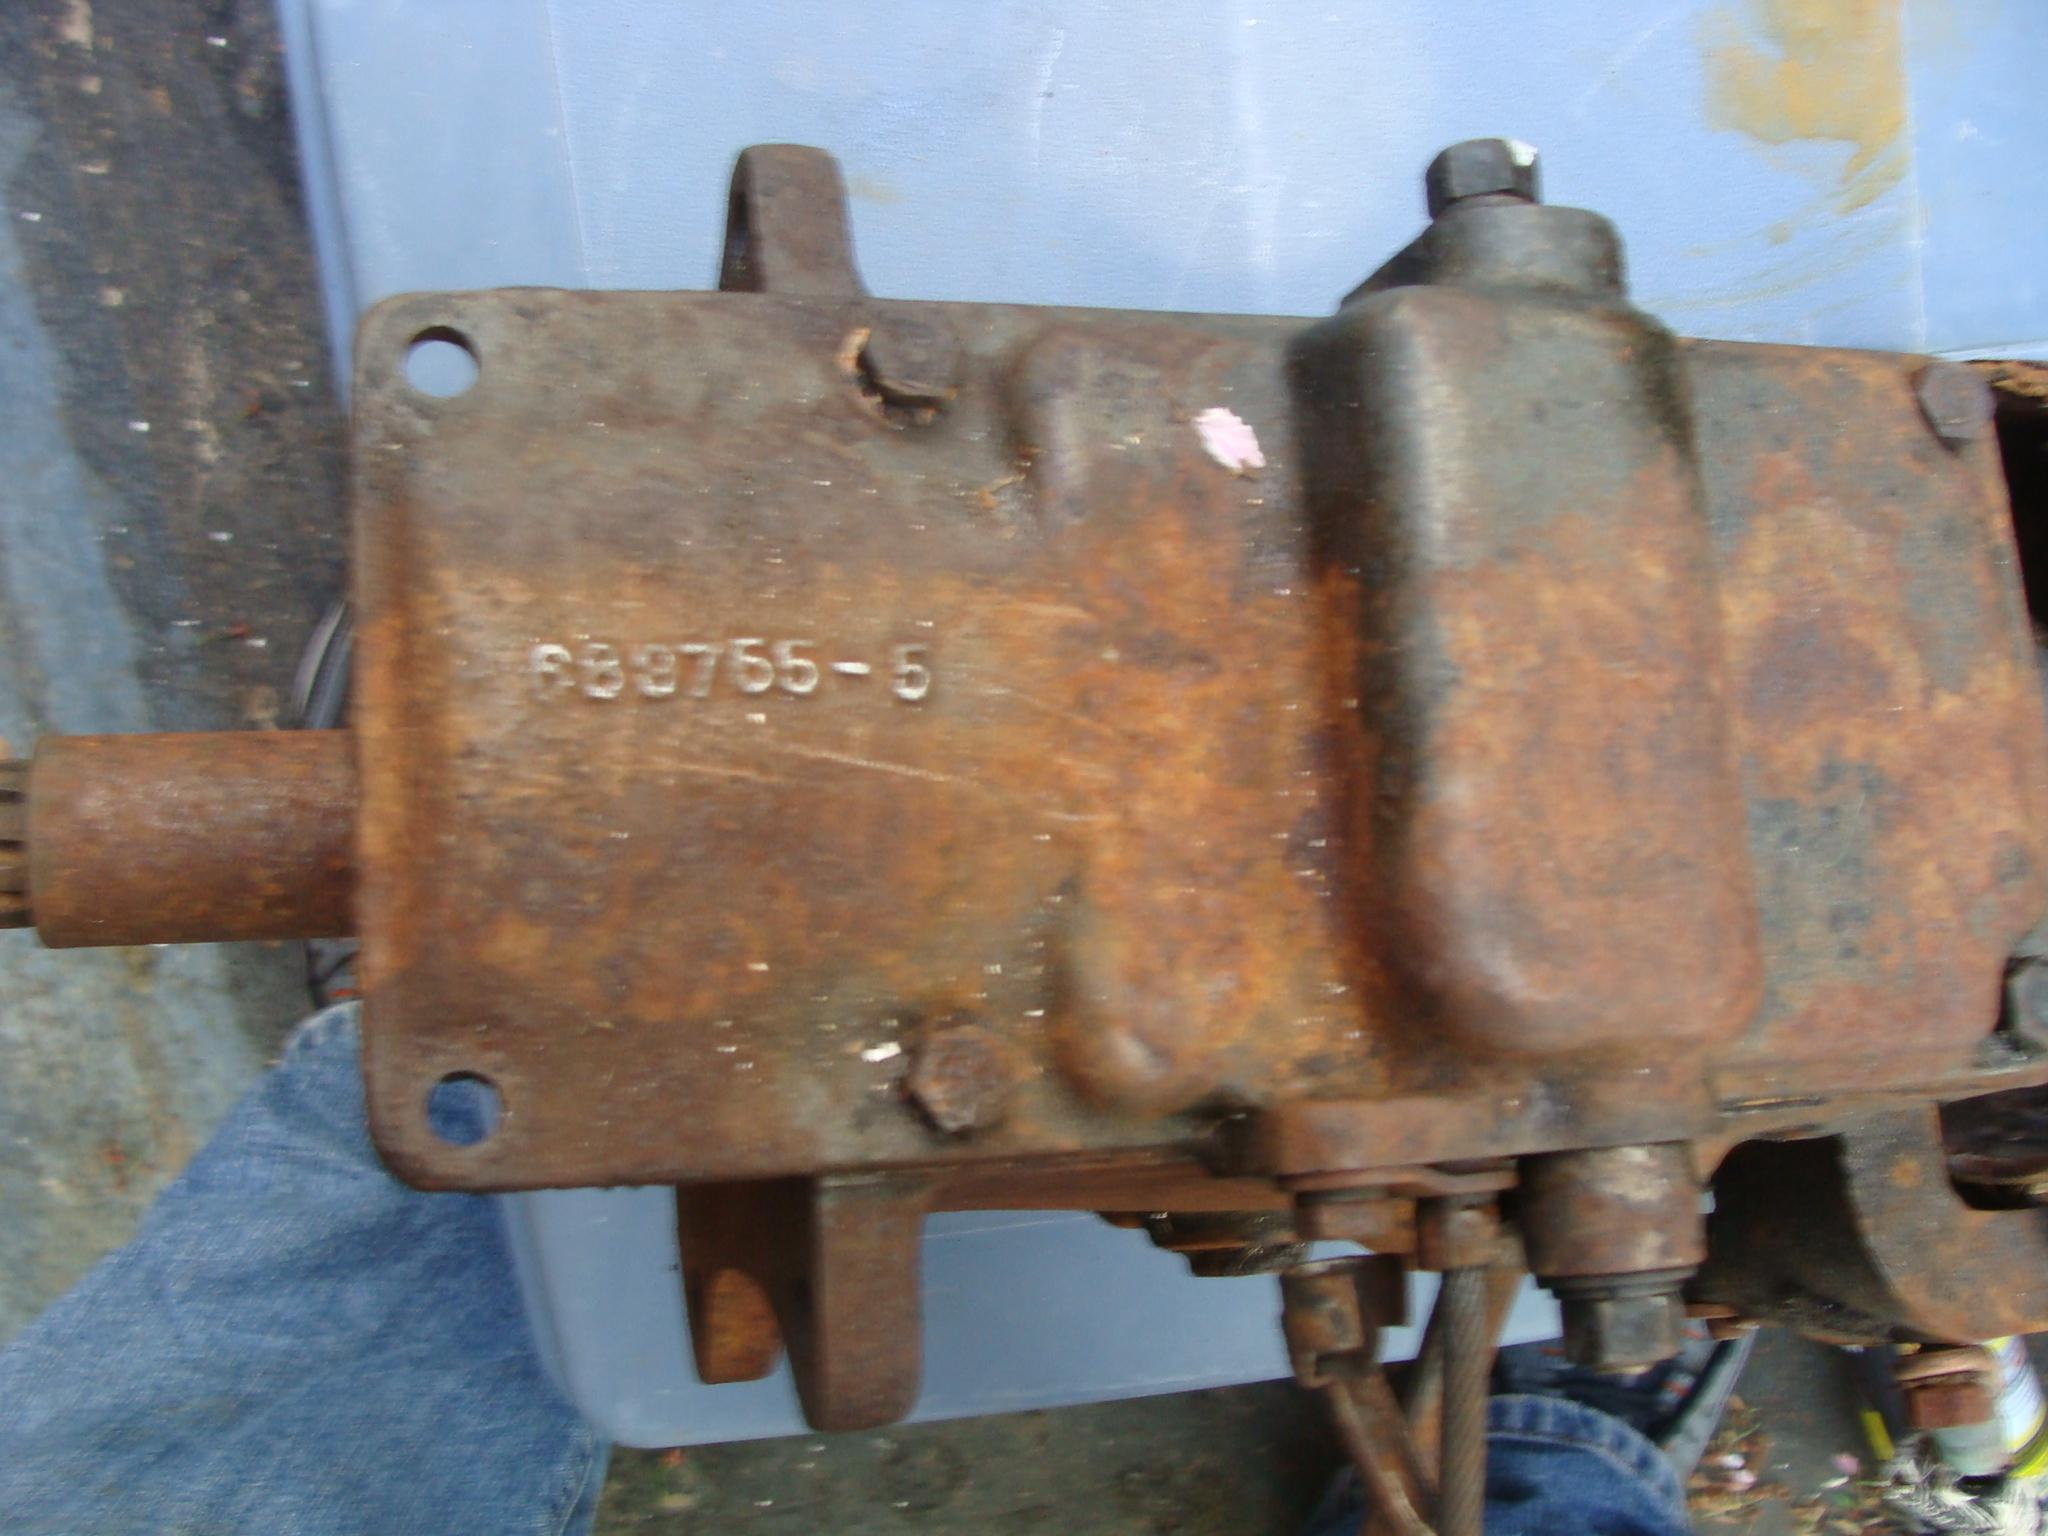 3 speed Dodge transmission 1939? - Parts For Sale - Antique